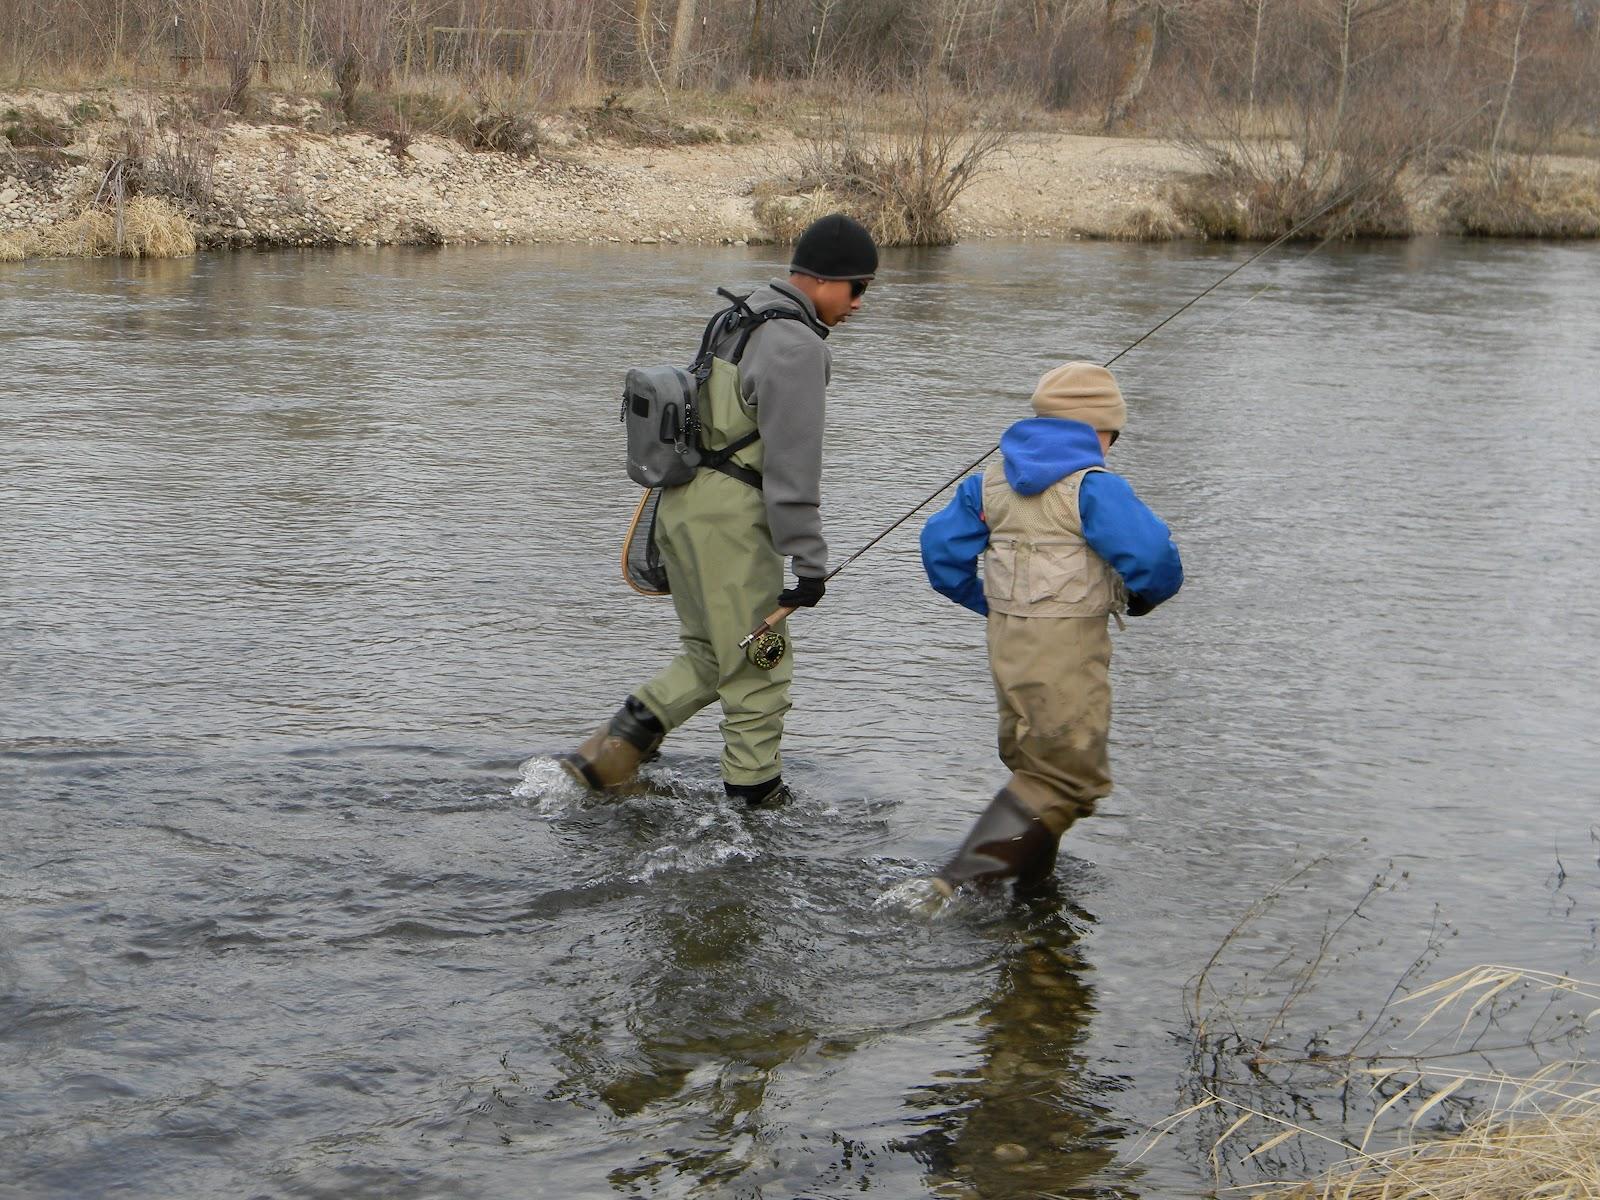 The quixotic angler the boise river near eagle id for Fly fishing boise idaho